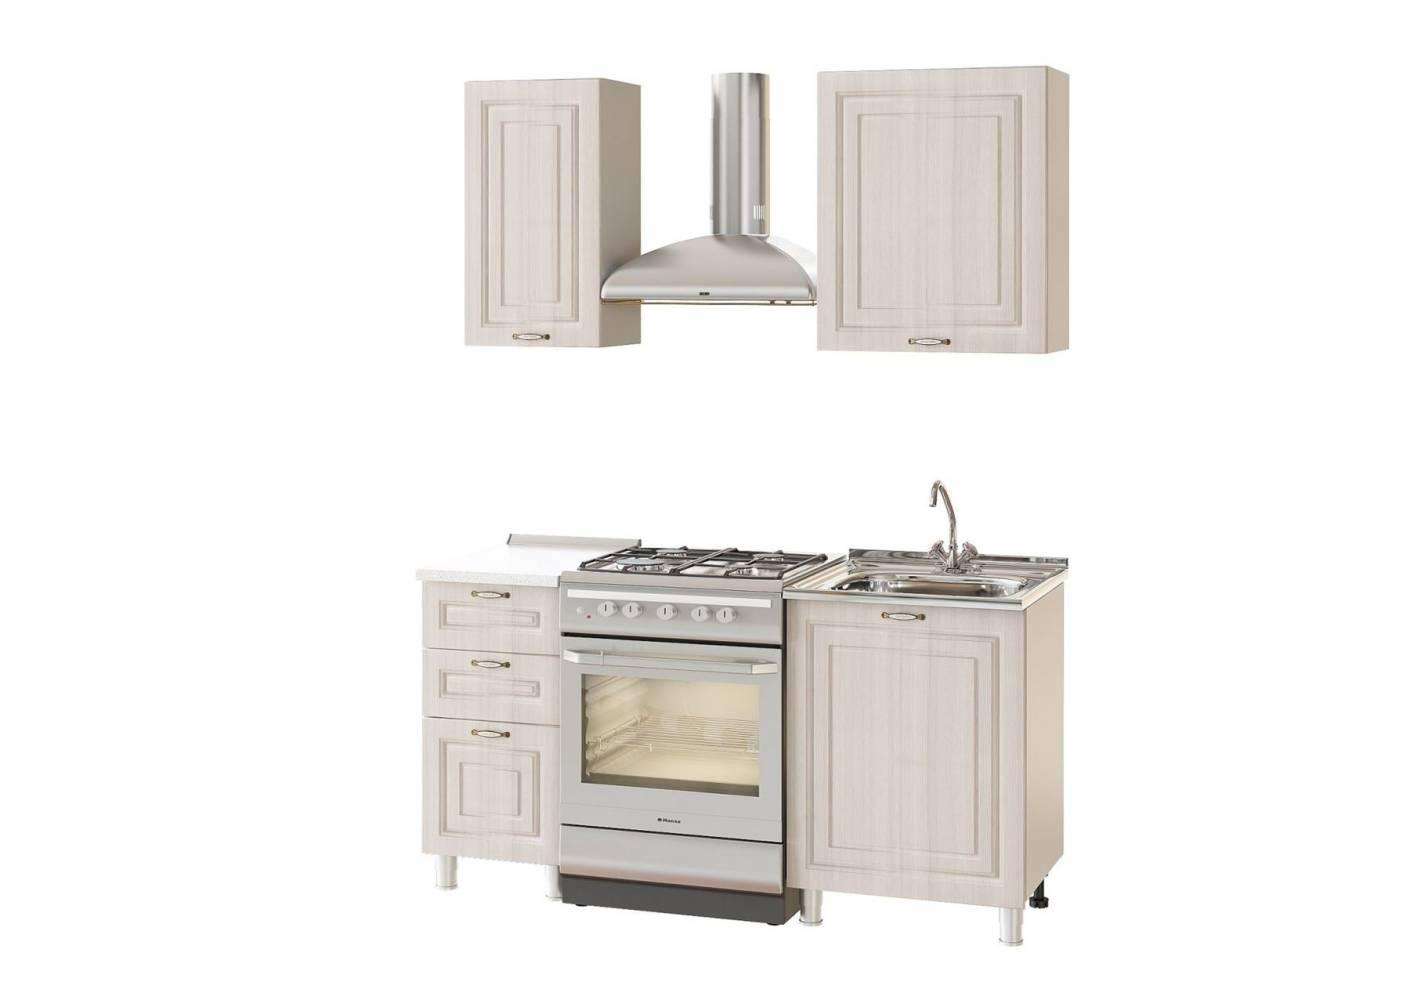 Модульная кухня Прованс 2 (BTS). Комплект 2